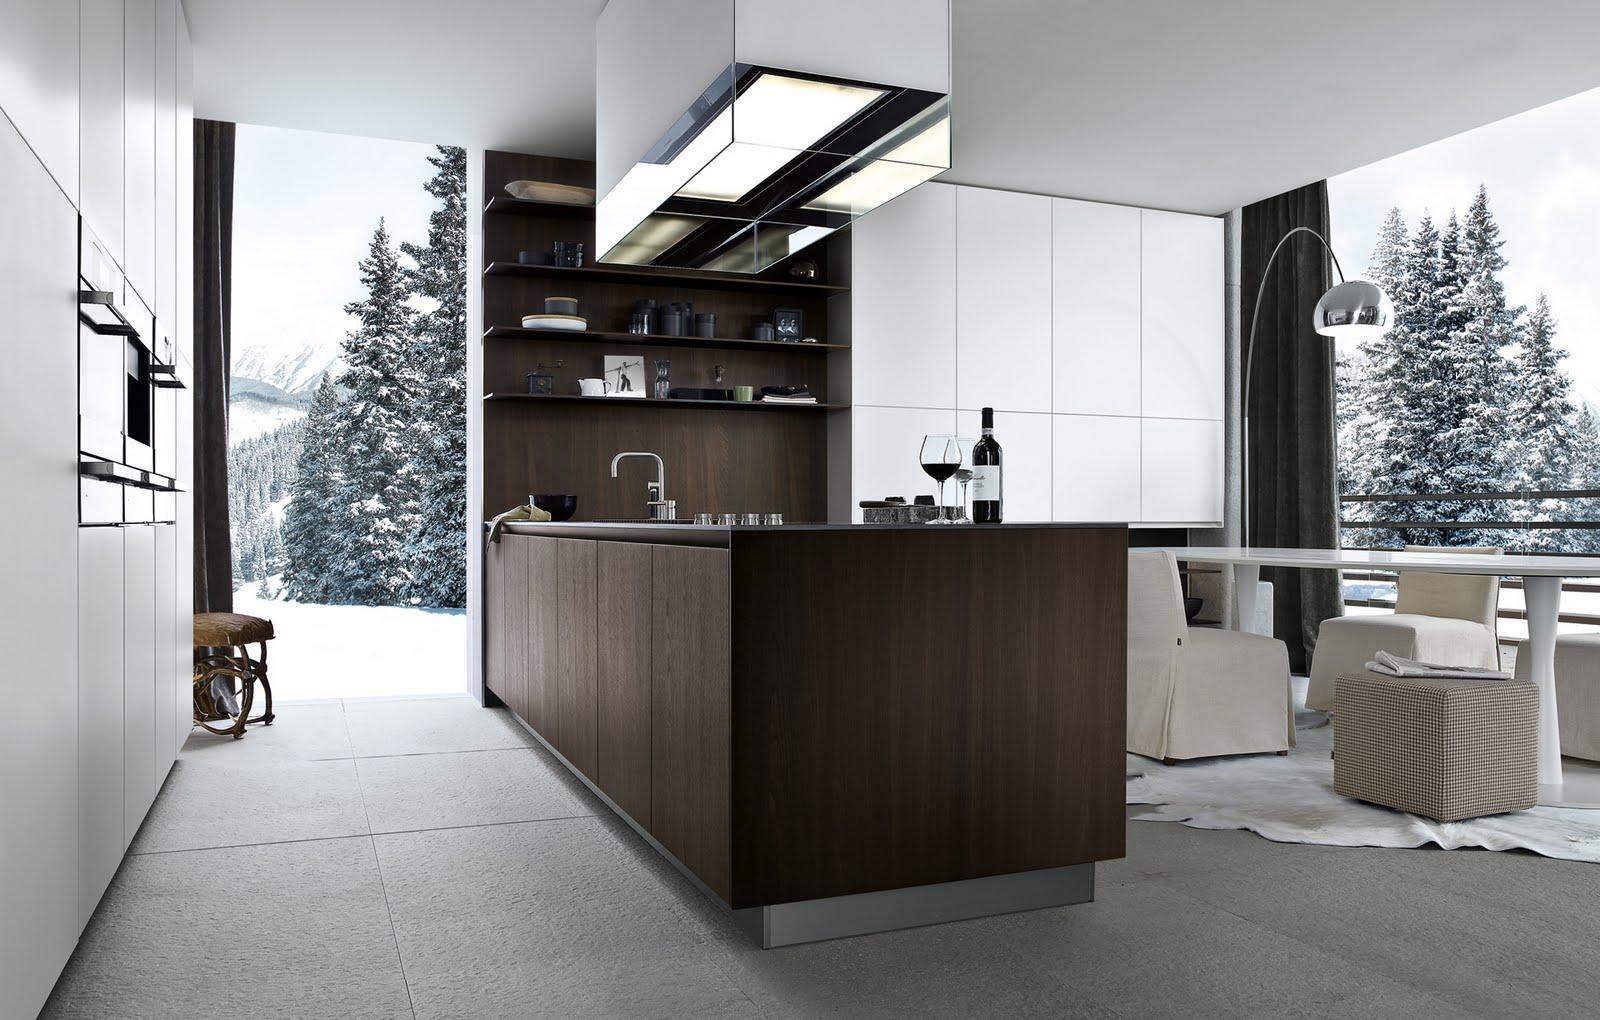 Adventurous Design Quest Twelve Kitchen by Carlo Colombo from Varenna Poliform